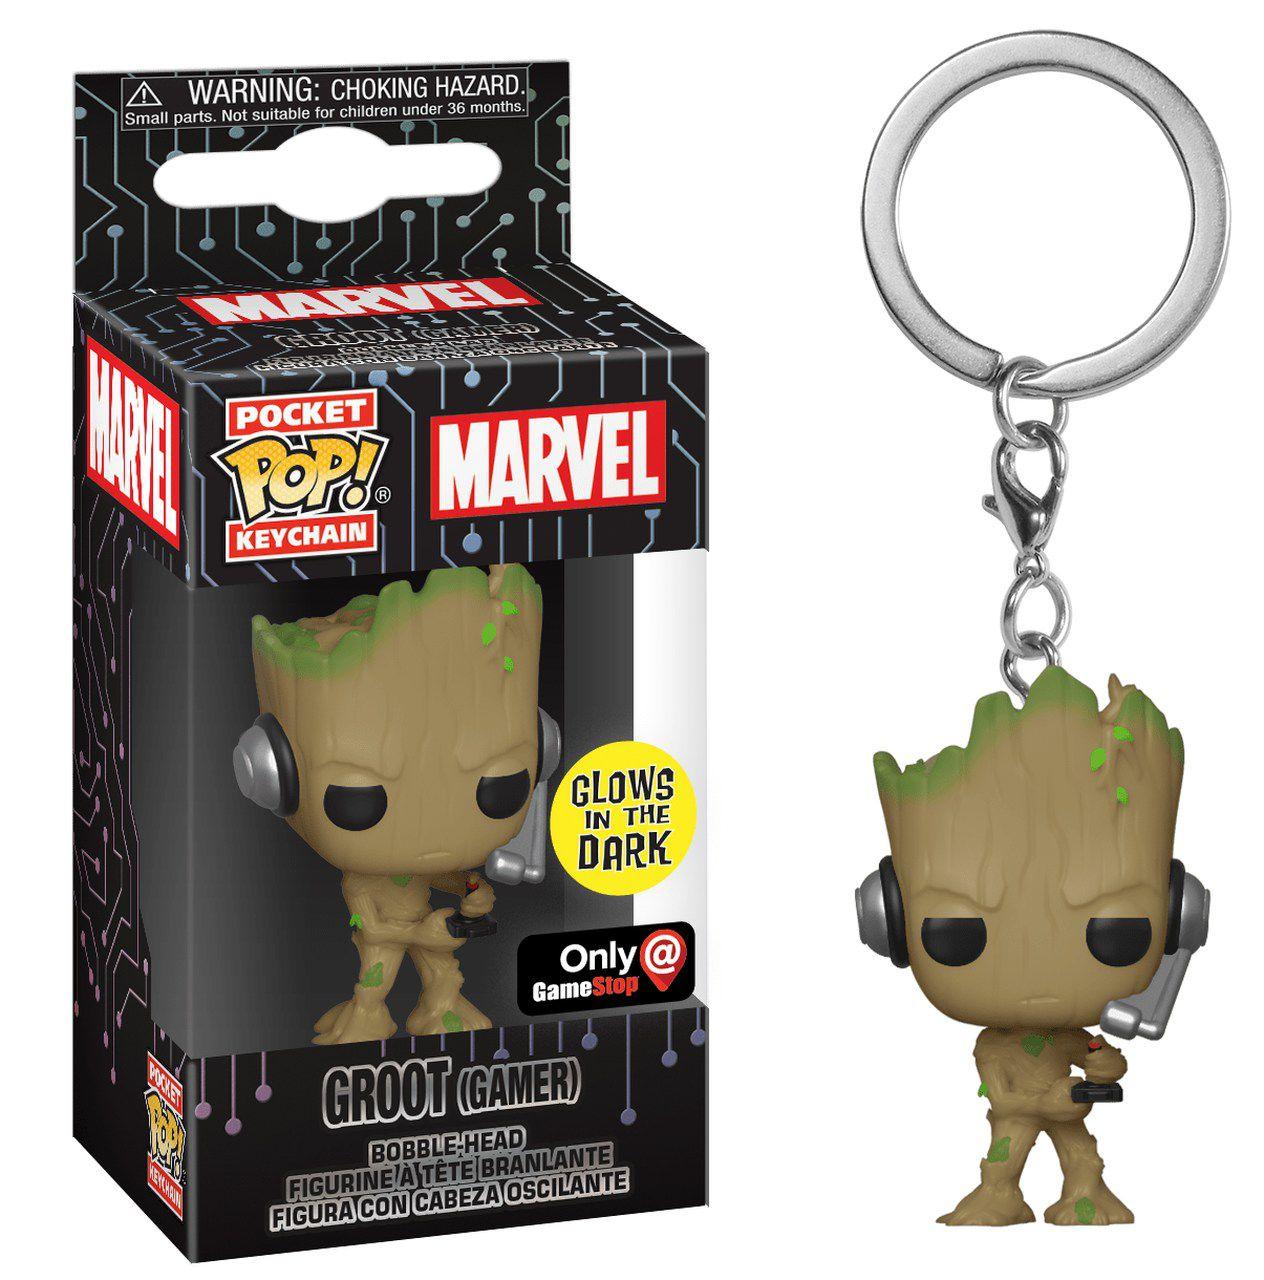 Funko Pocket Pop Keychains (Chaveiro) Groot (Gamer) GITD: Marvel Comics - Funko